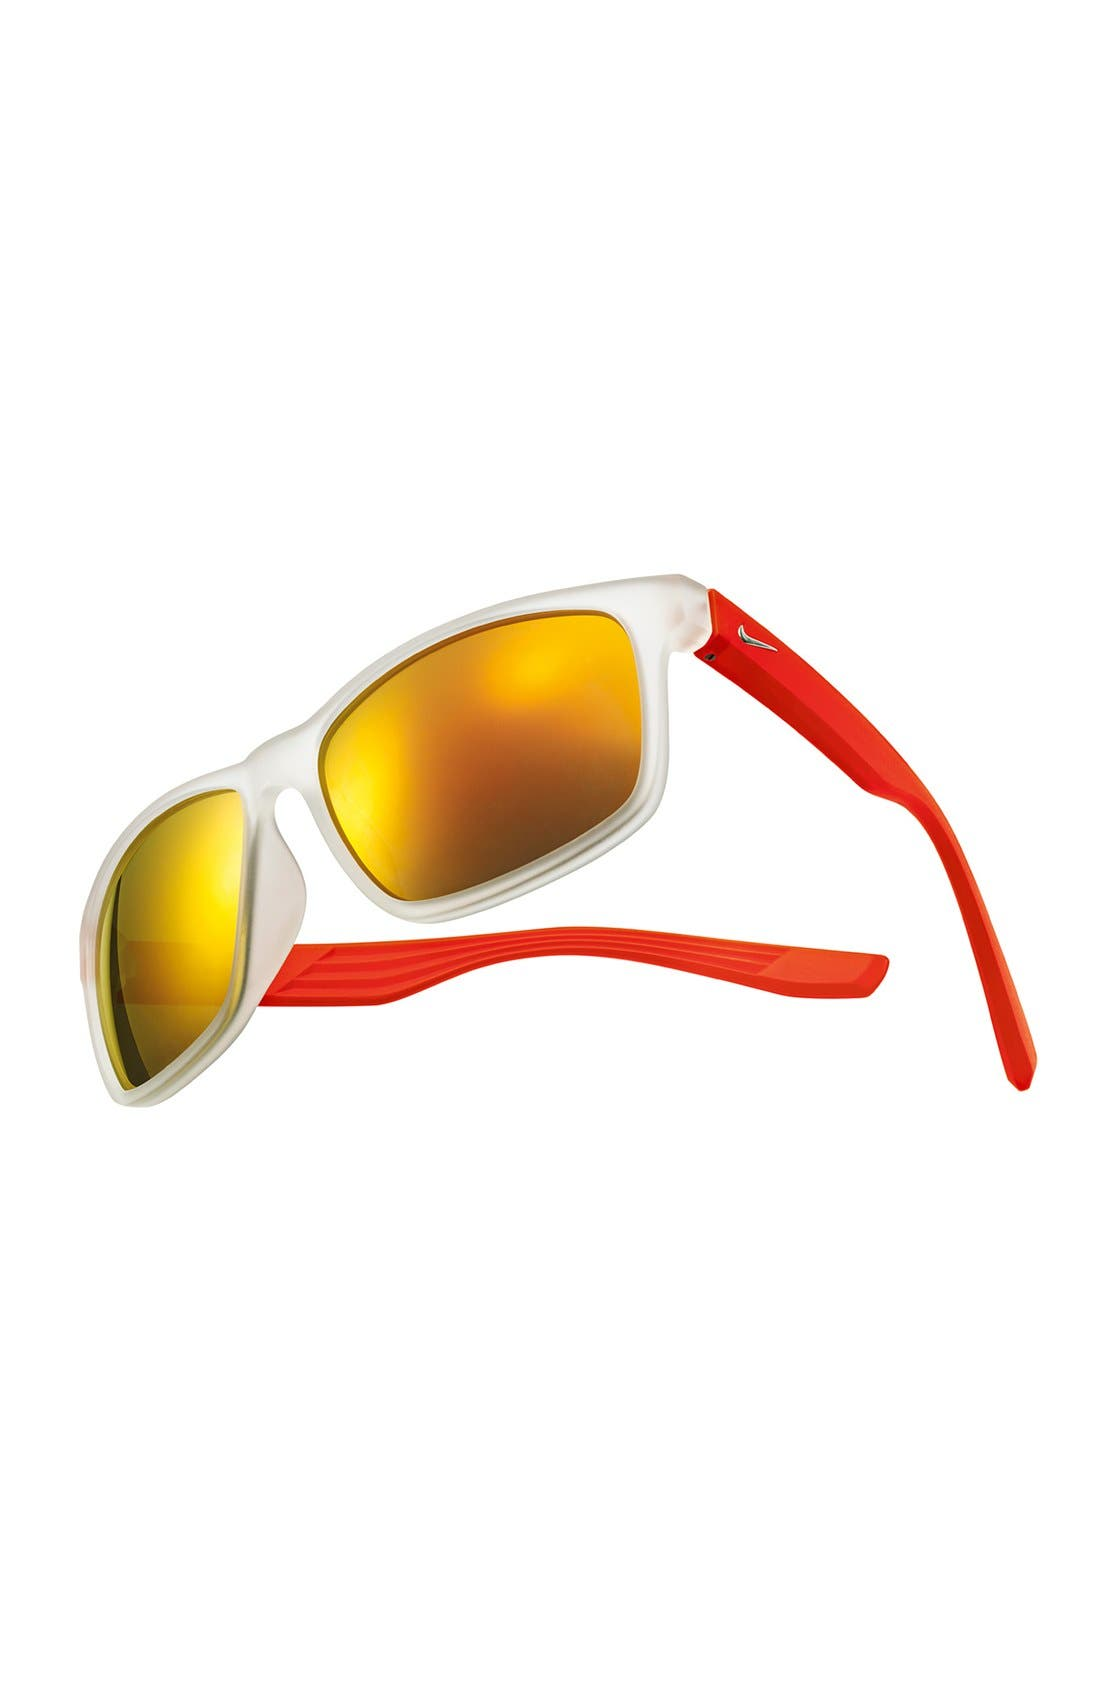 Alternate Image 2  - Nike 'Cruiser' 59mm Sunglasses